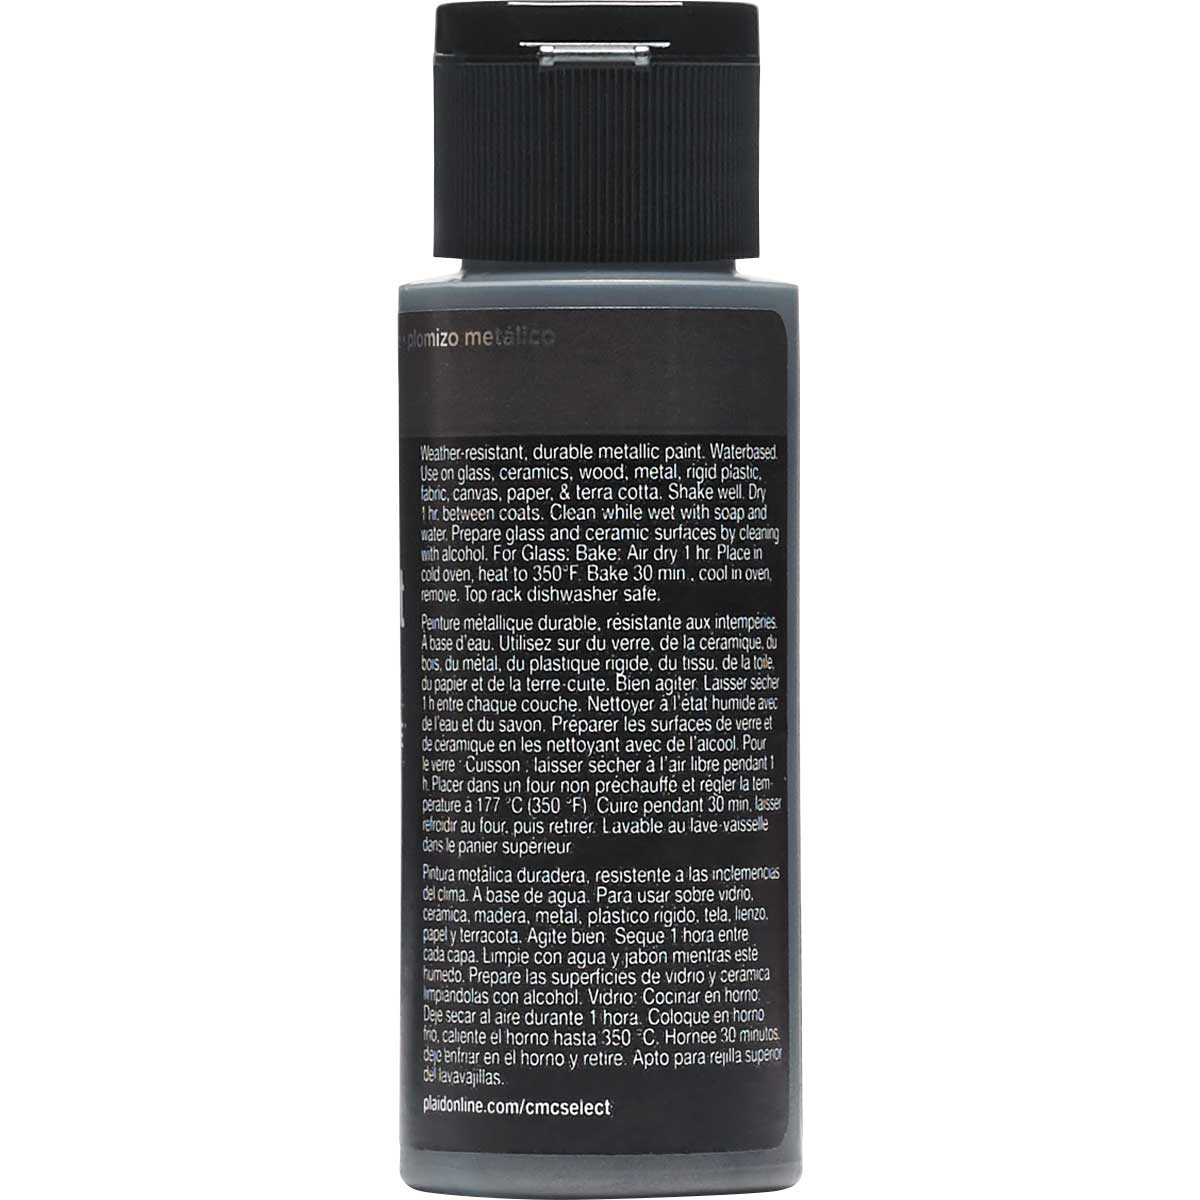 Delta Ceramcoat ® Select Multi-Surface Acrylic Paint - Metallic - Gunmetal, 2 oz.